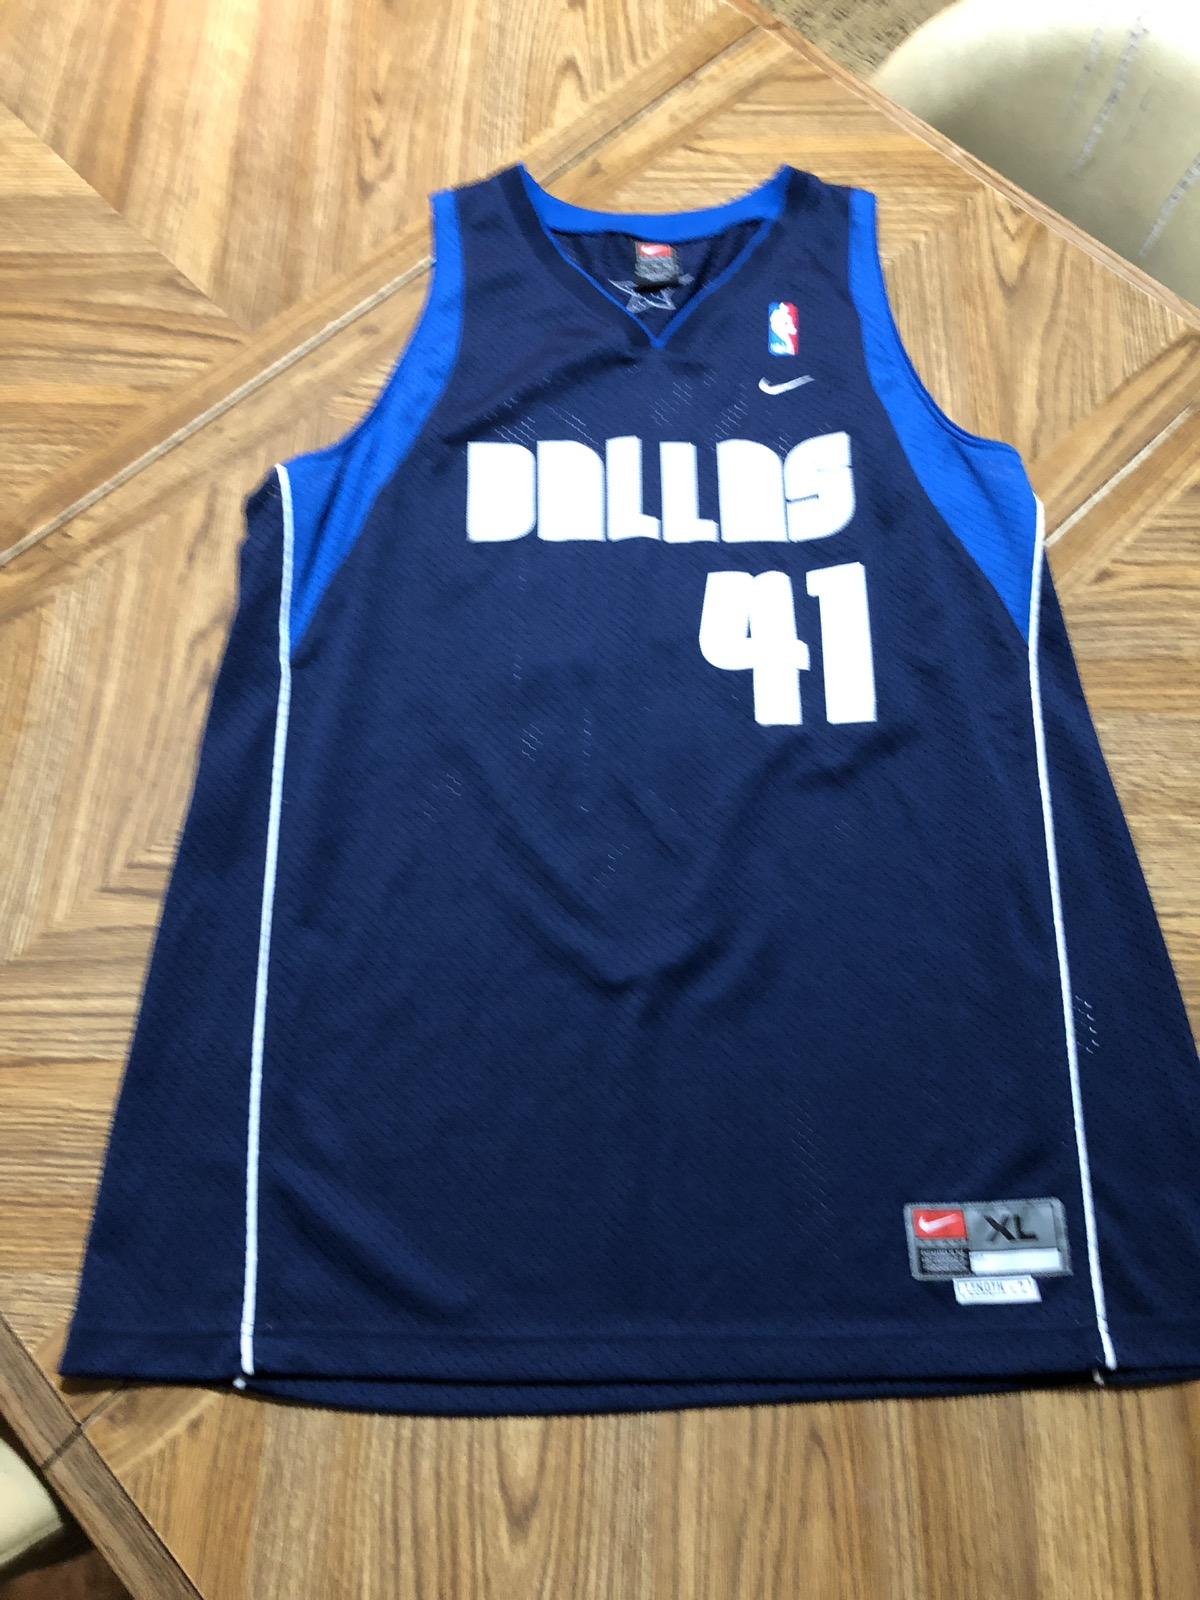 7af719e90561 Jersey ×. Dallas Mavericks Dirk Nowitzki Jersey